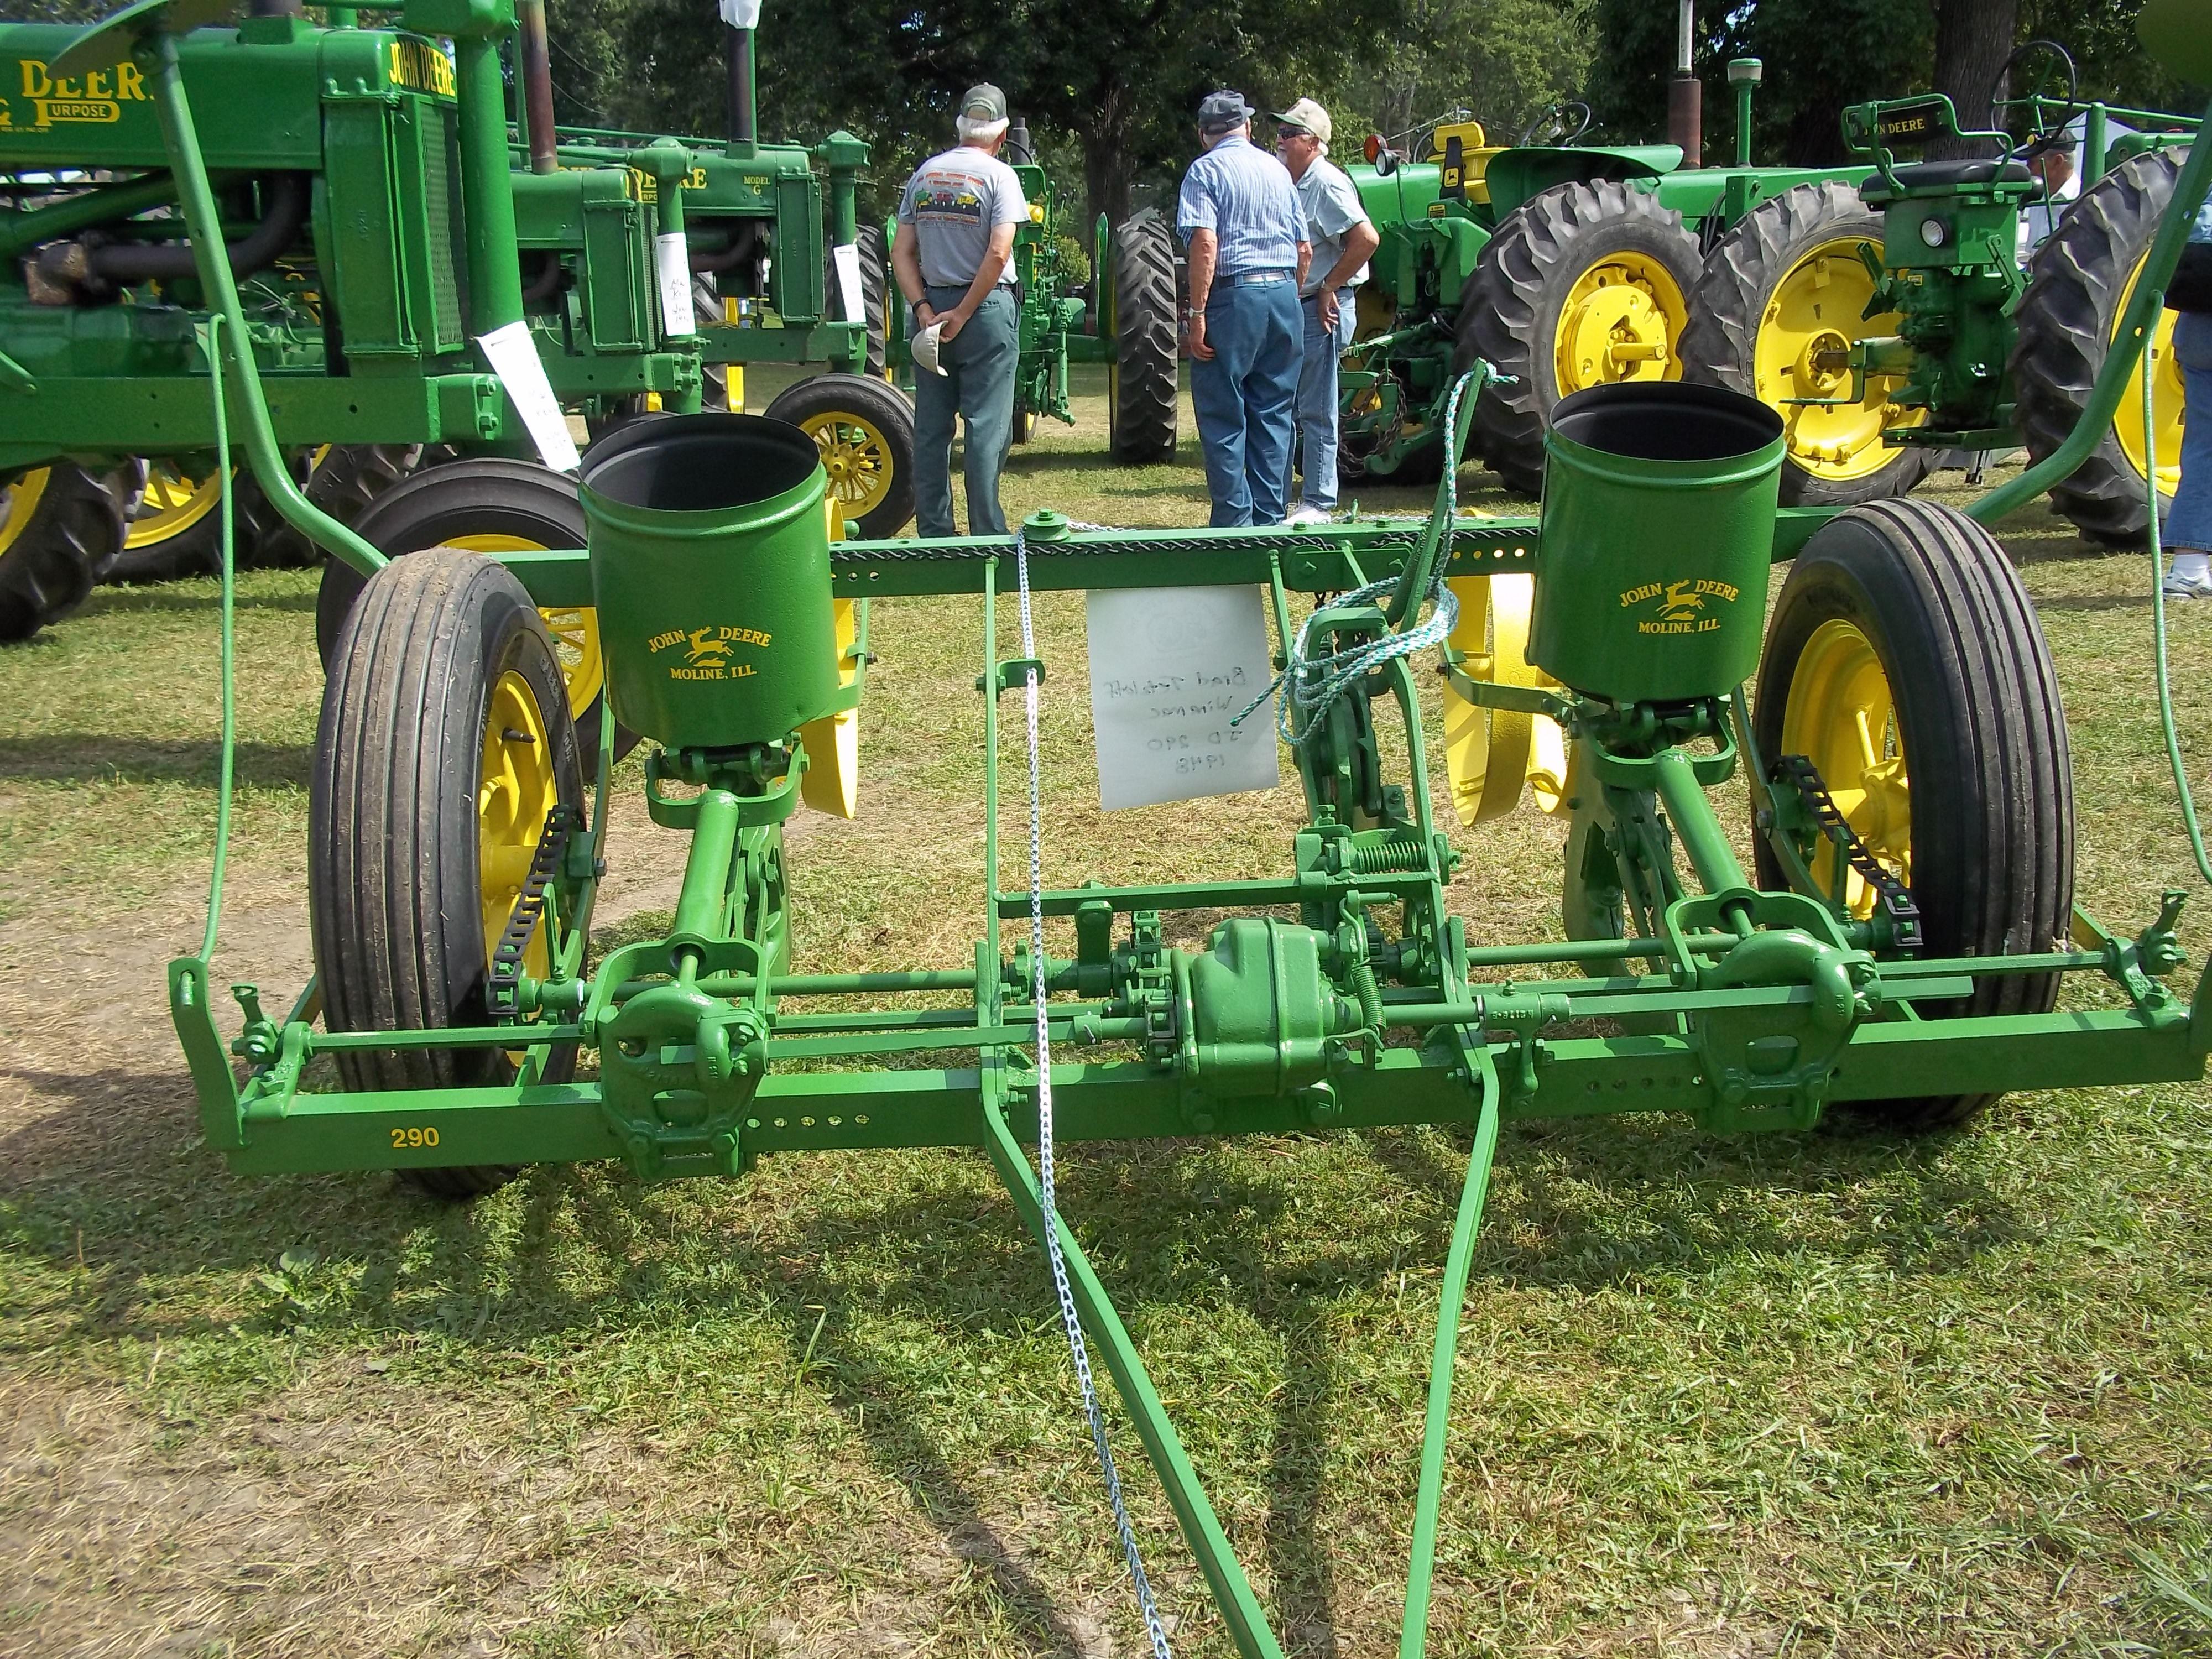 Old 2 Row Corn Planter John Deere Equipment John Deere Equipment